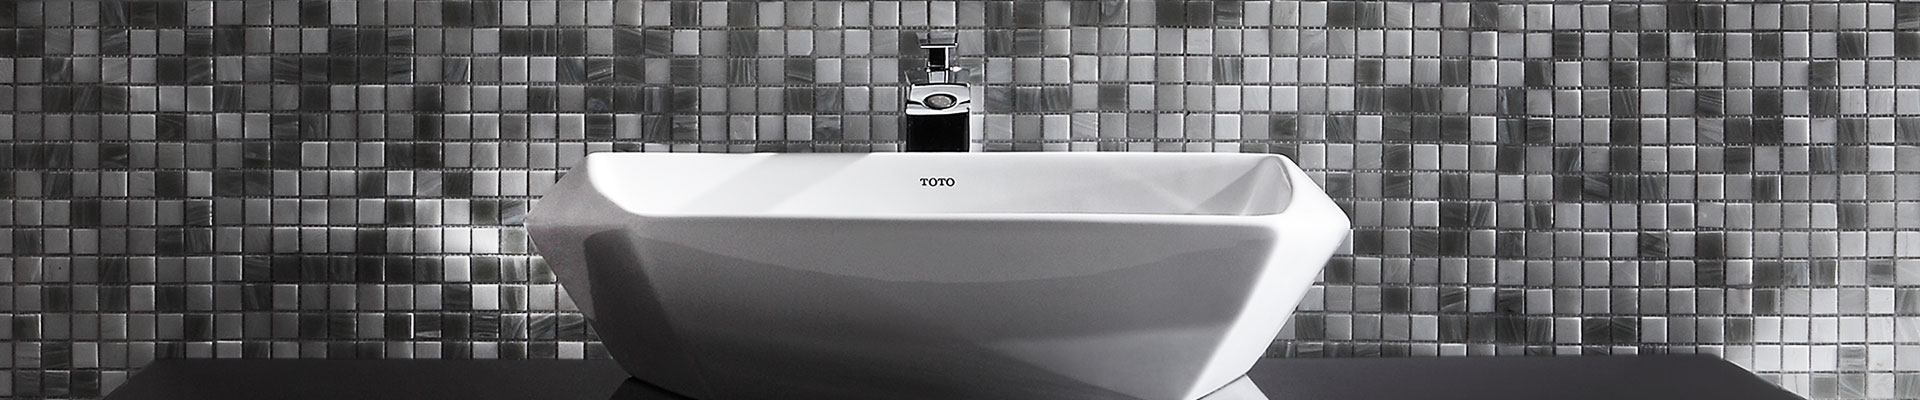 Lavabo - Chậu rửa đặt bàn TOTO